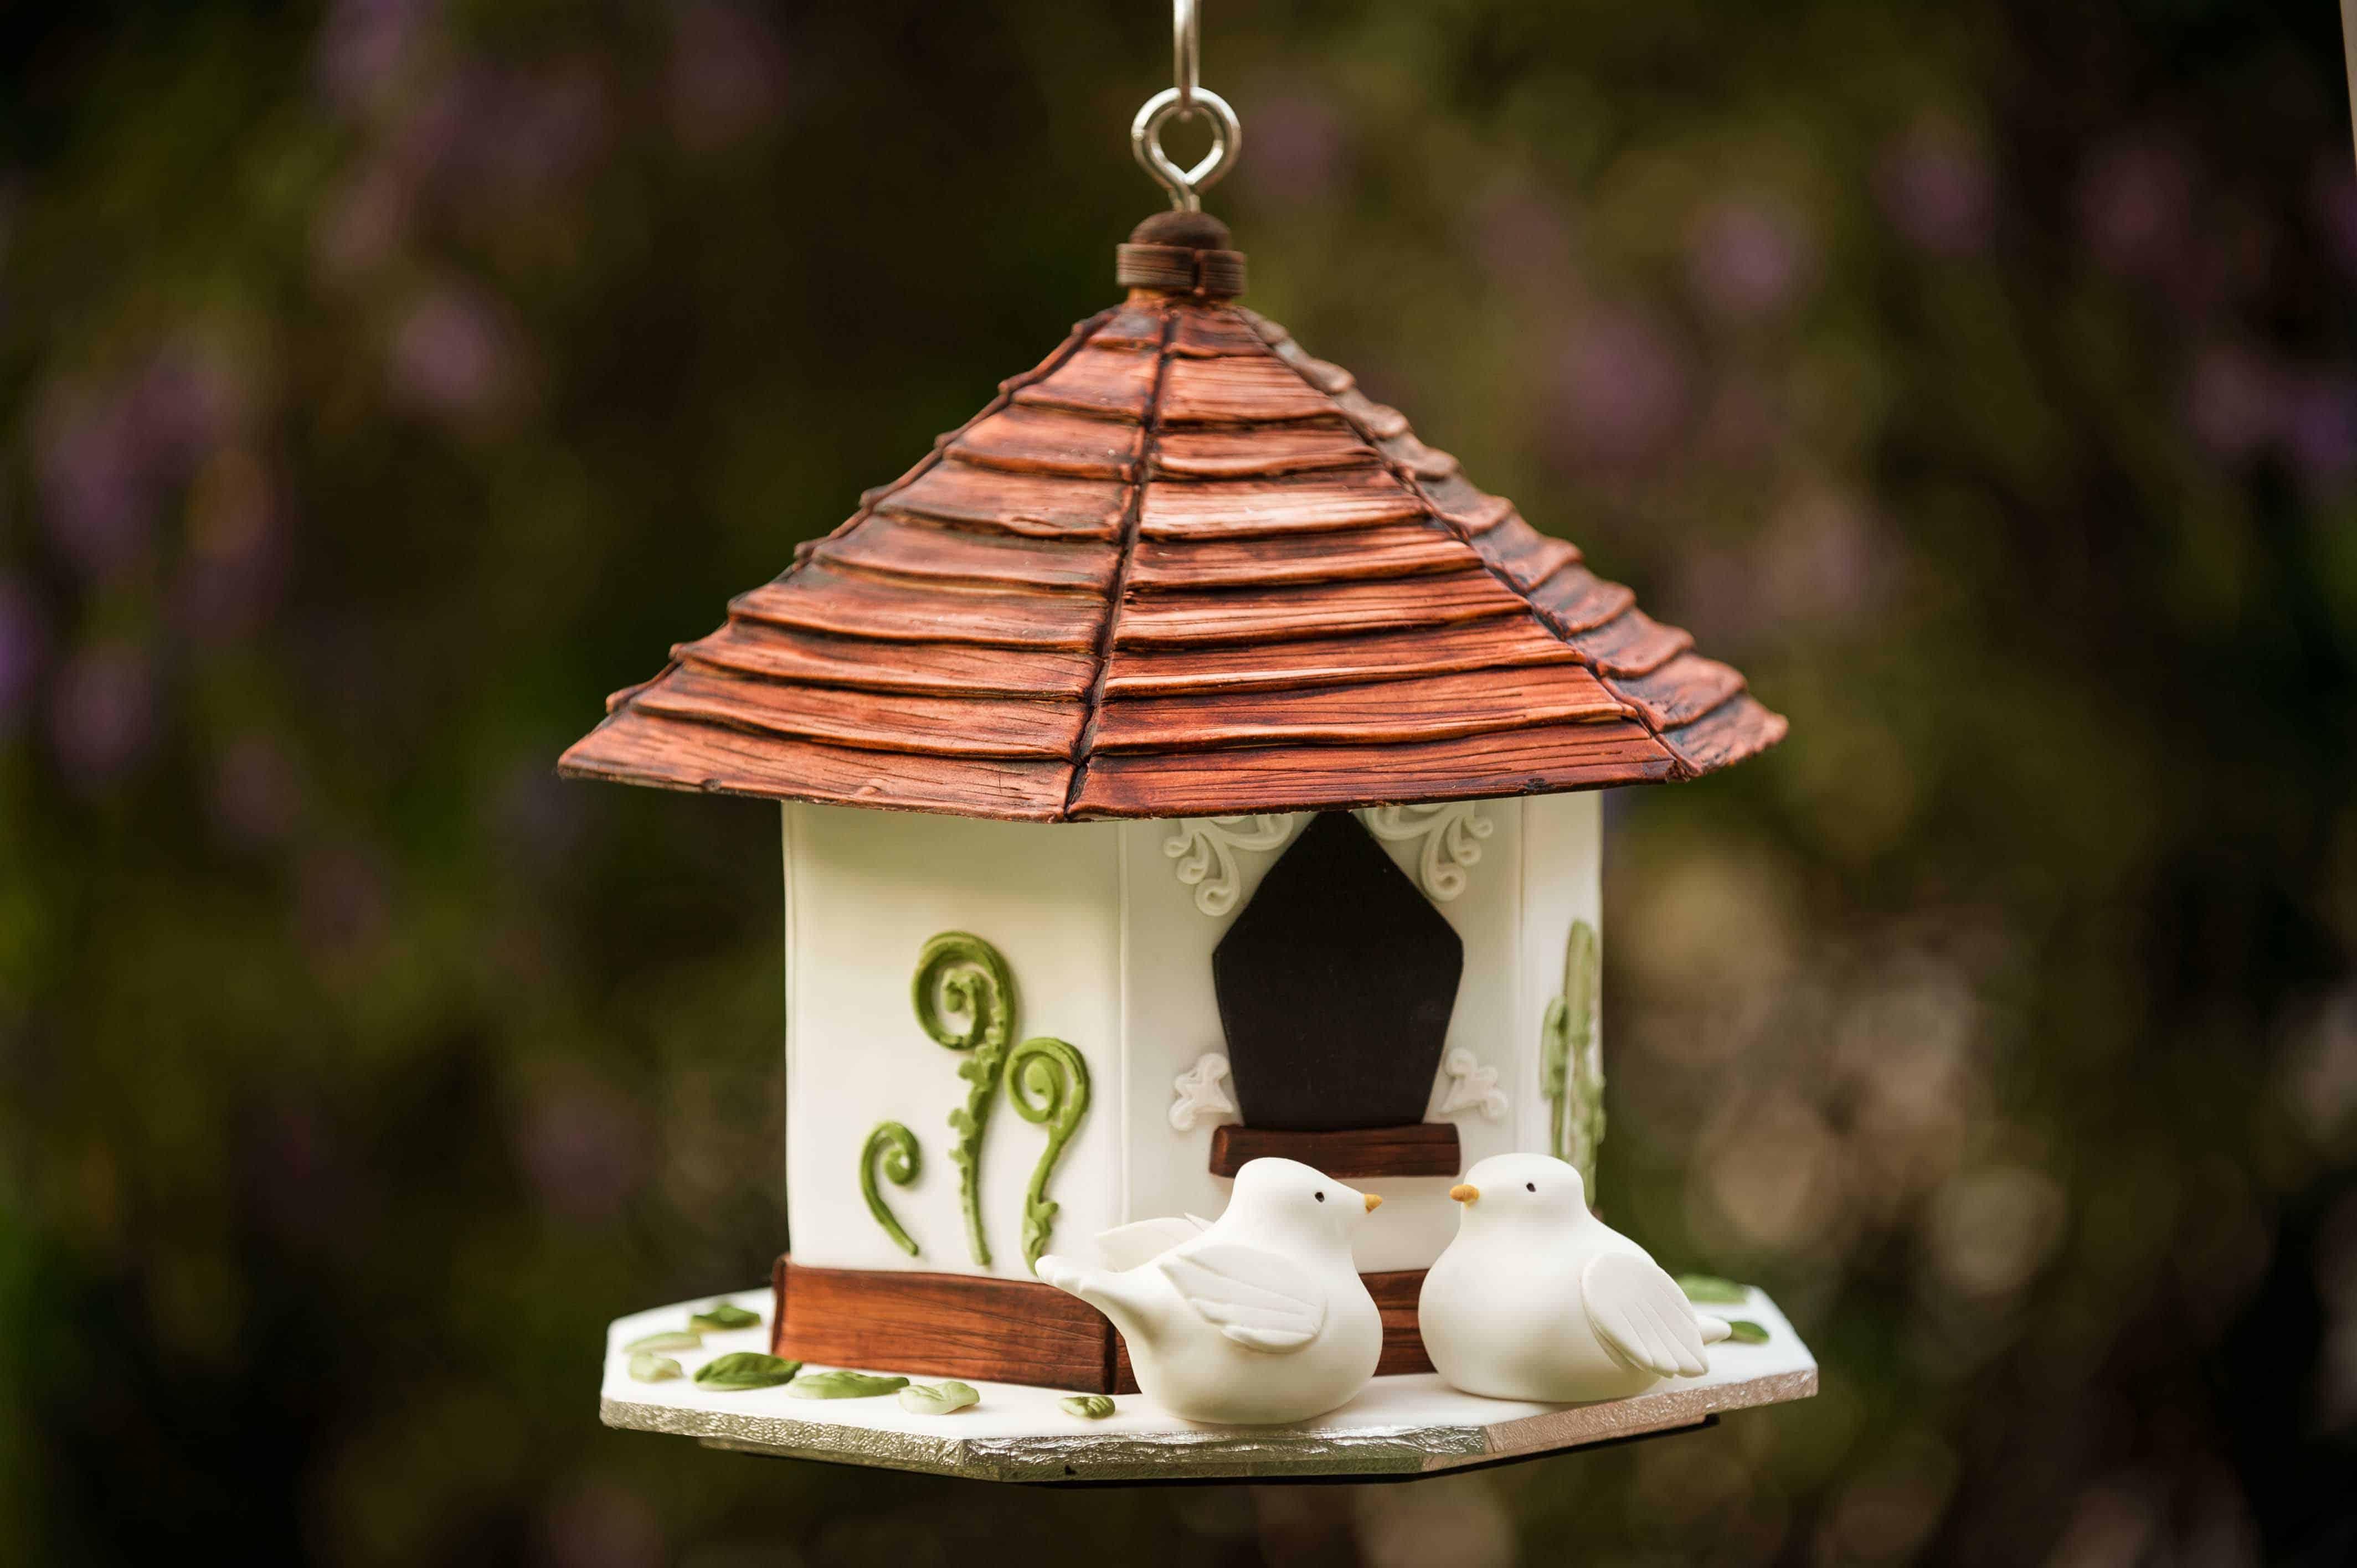 Bird House Cake Insane Baking Creations